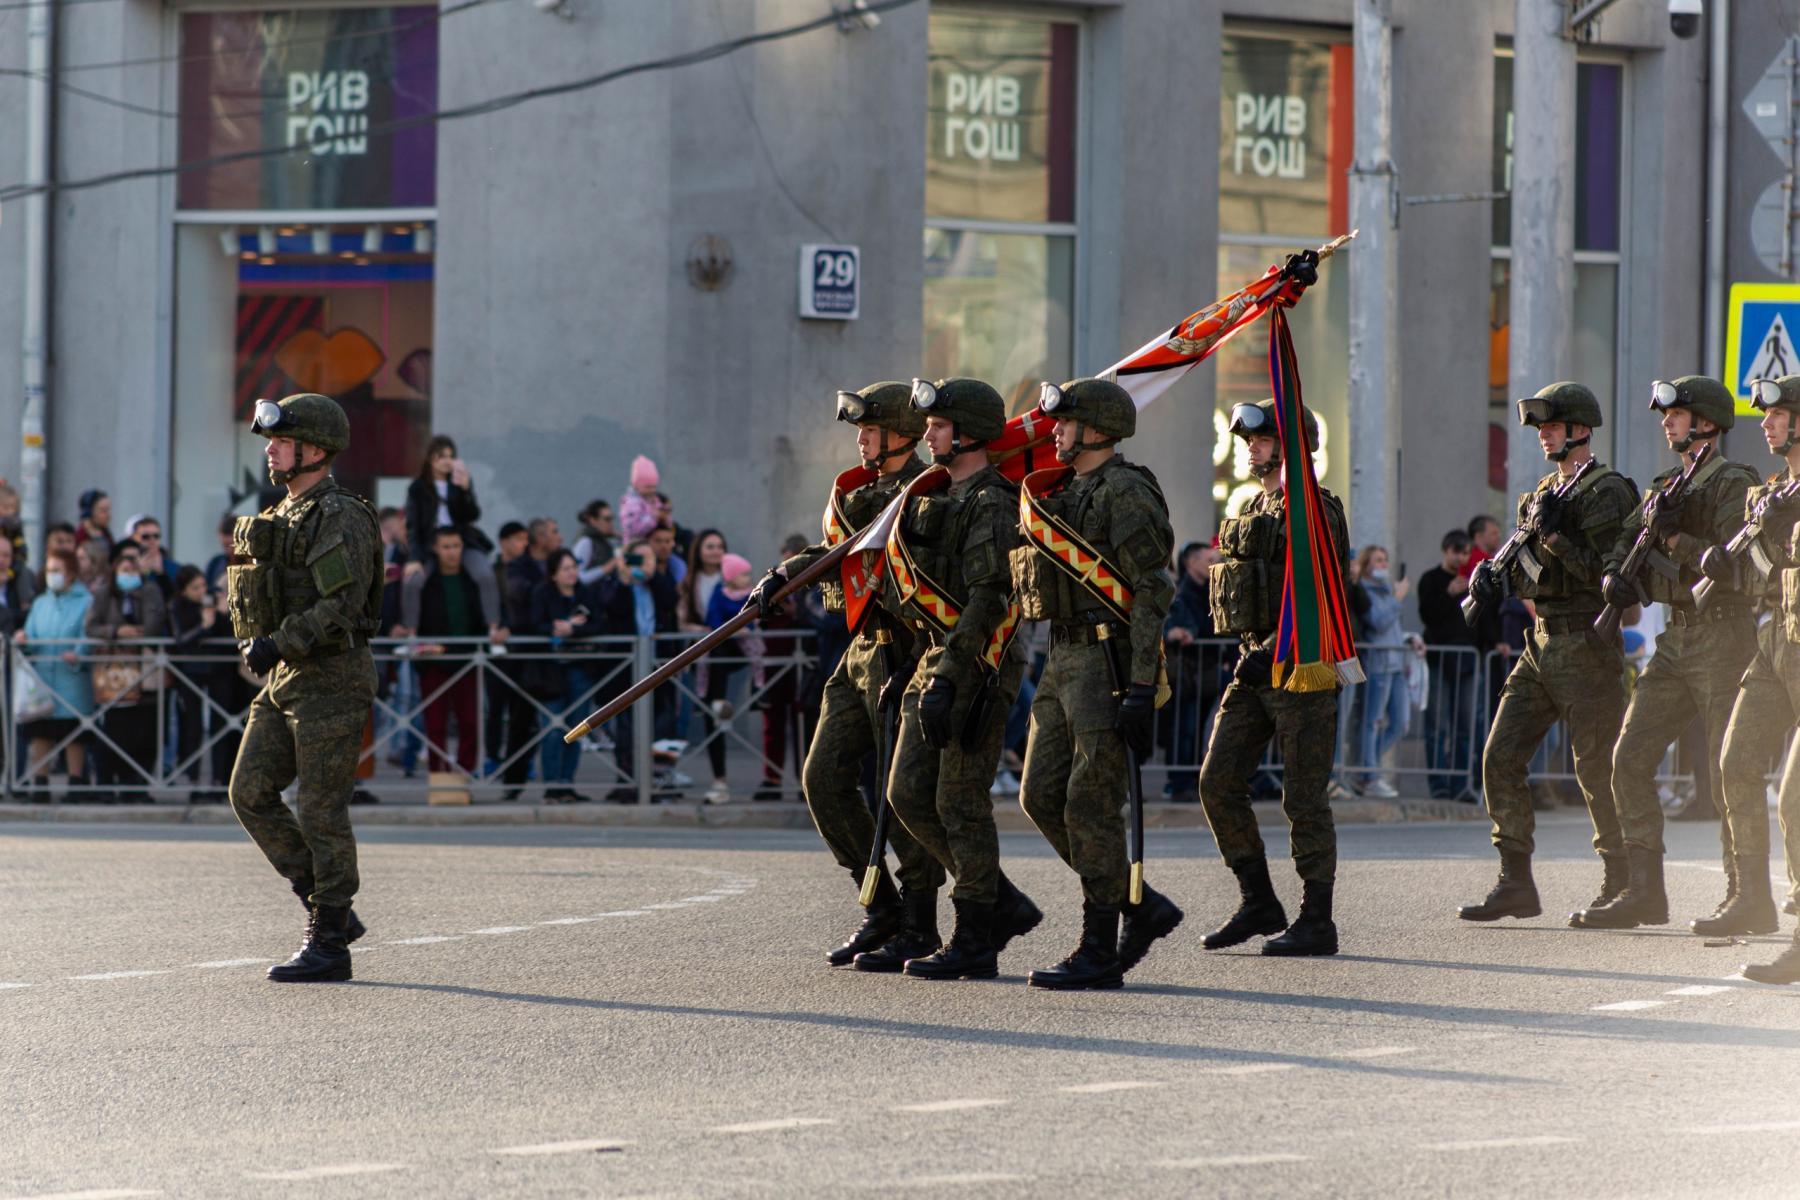 Фото Флаги, форма, техника, толпы зрителей: лучшие фото с репетиции парада в Новосибирске 2